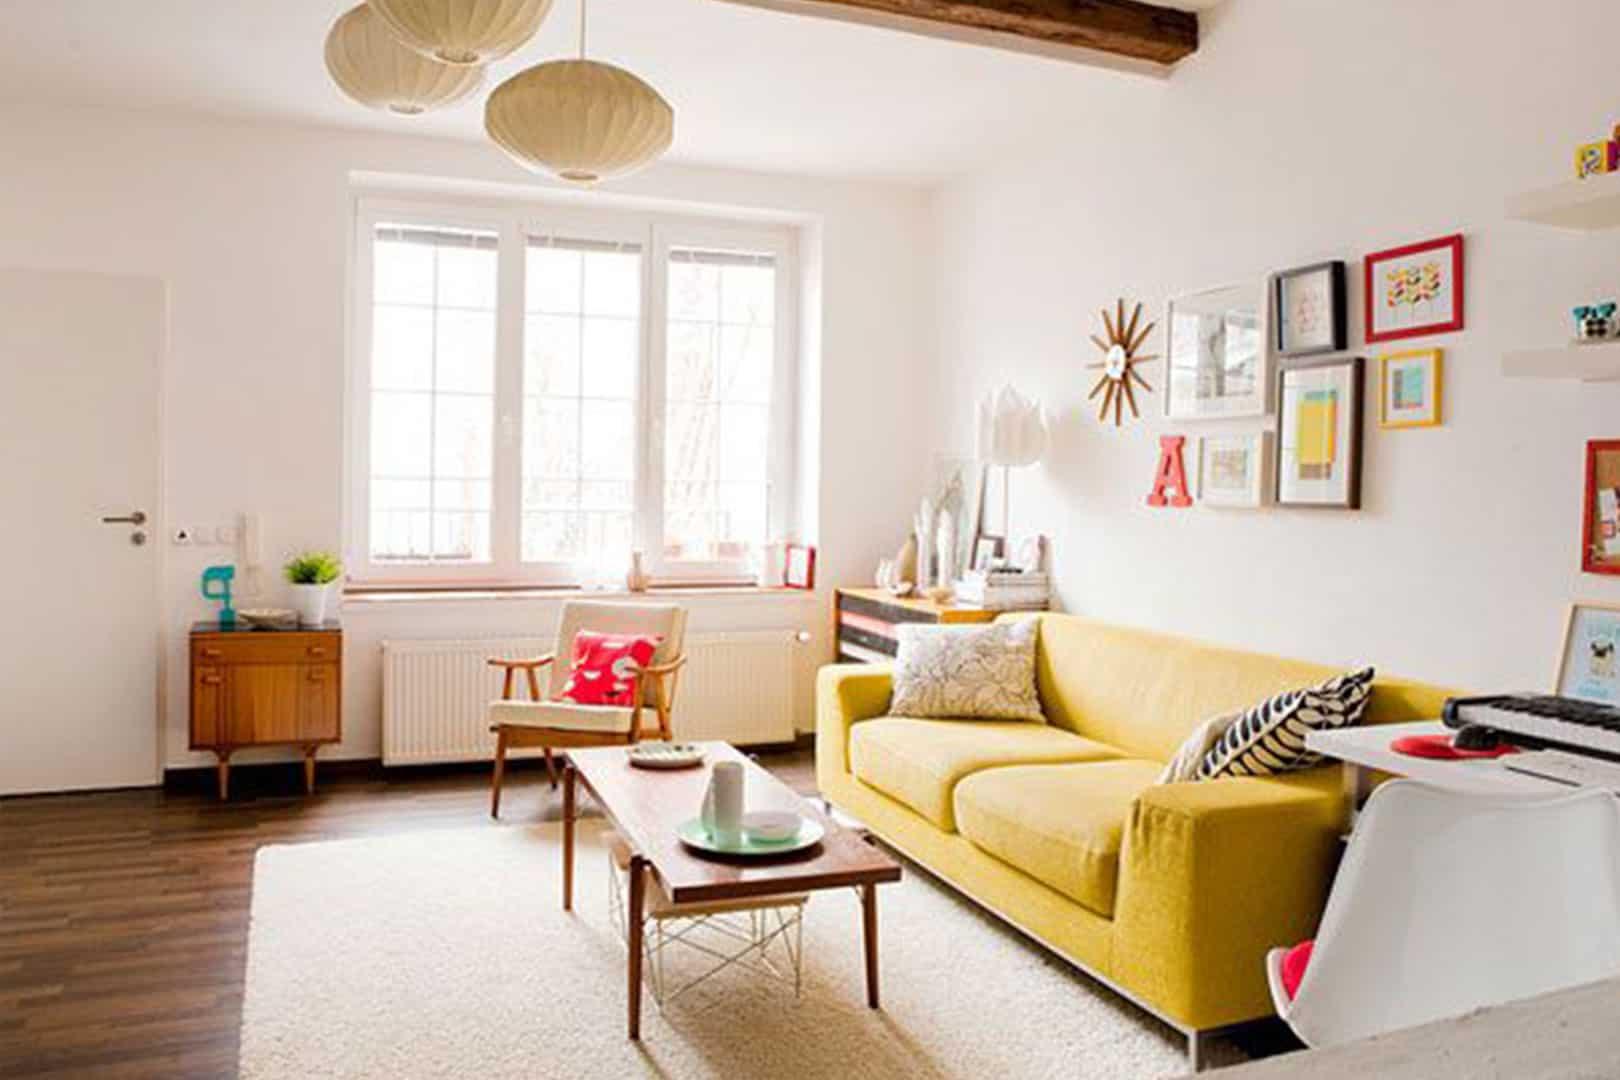 beautiful-simple-modern-living-room-design-ideas-yellow-modern-sofa-brown-laminated-wooden-table-white-wall-brown-laminated-wooden-floor-brown-laminated-wooden-cabinet-white-wall-white-rug-glass-windo